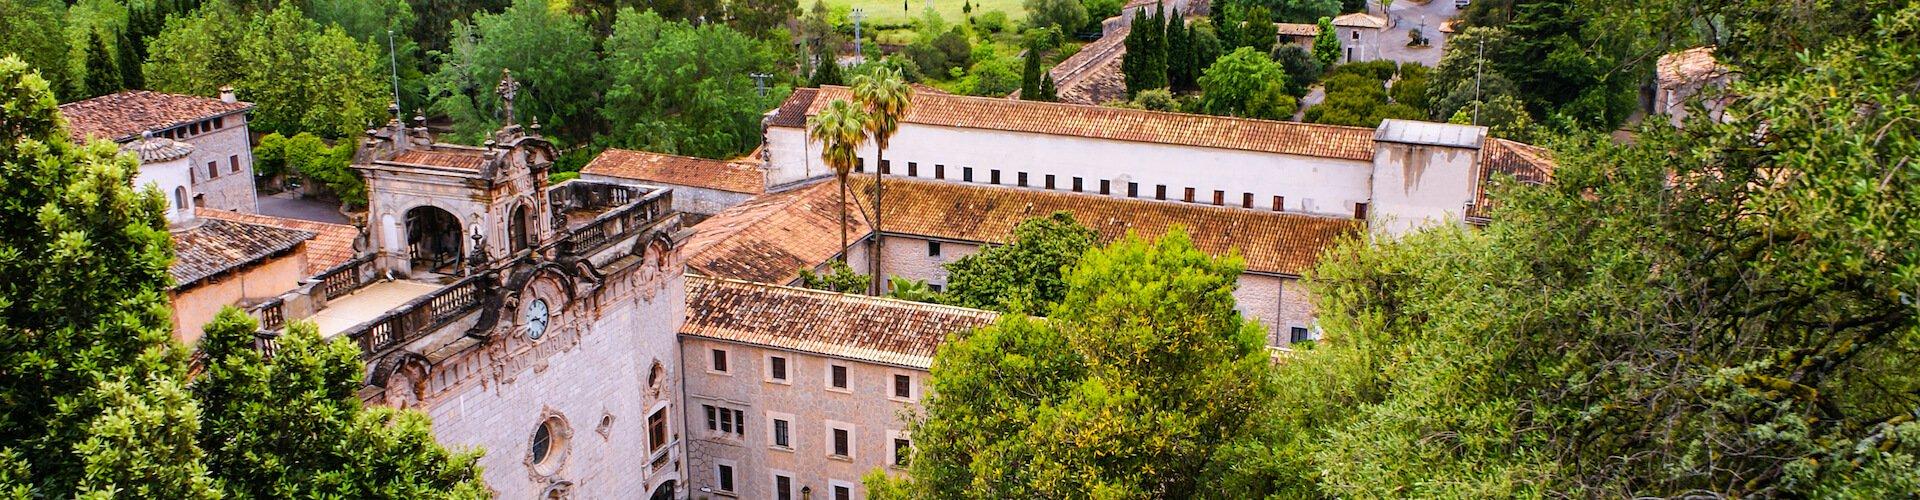 Ausflugsziel Kloster Lluc